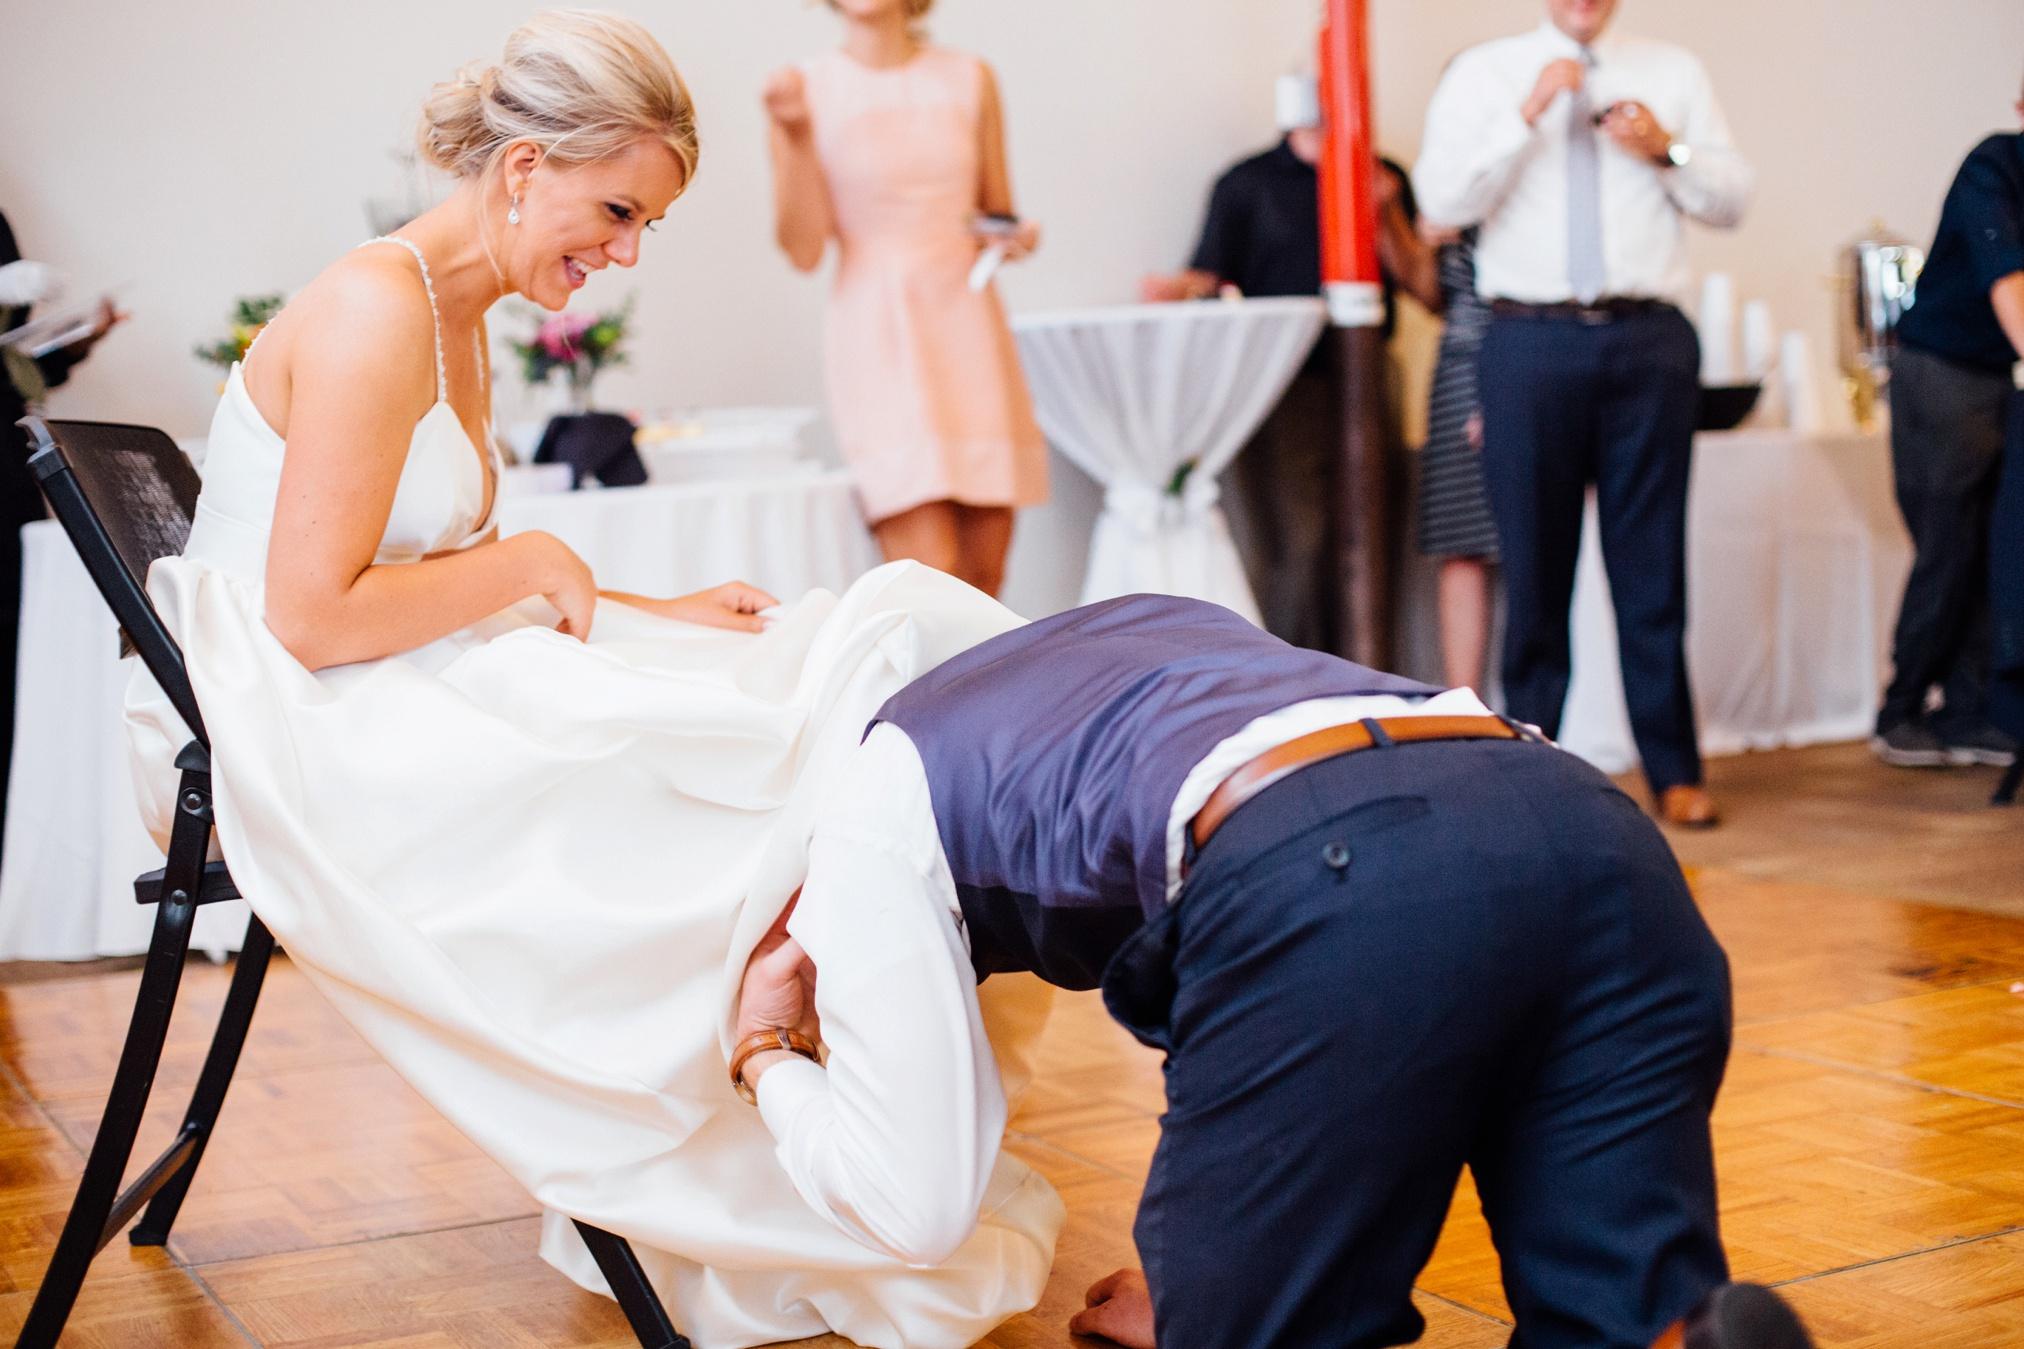 brenna+michael_wedding-810.jpg